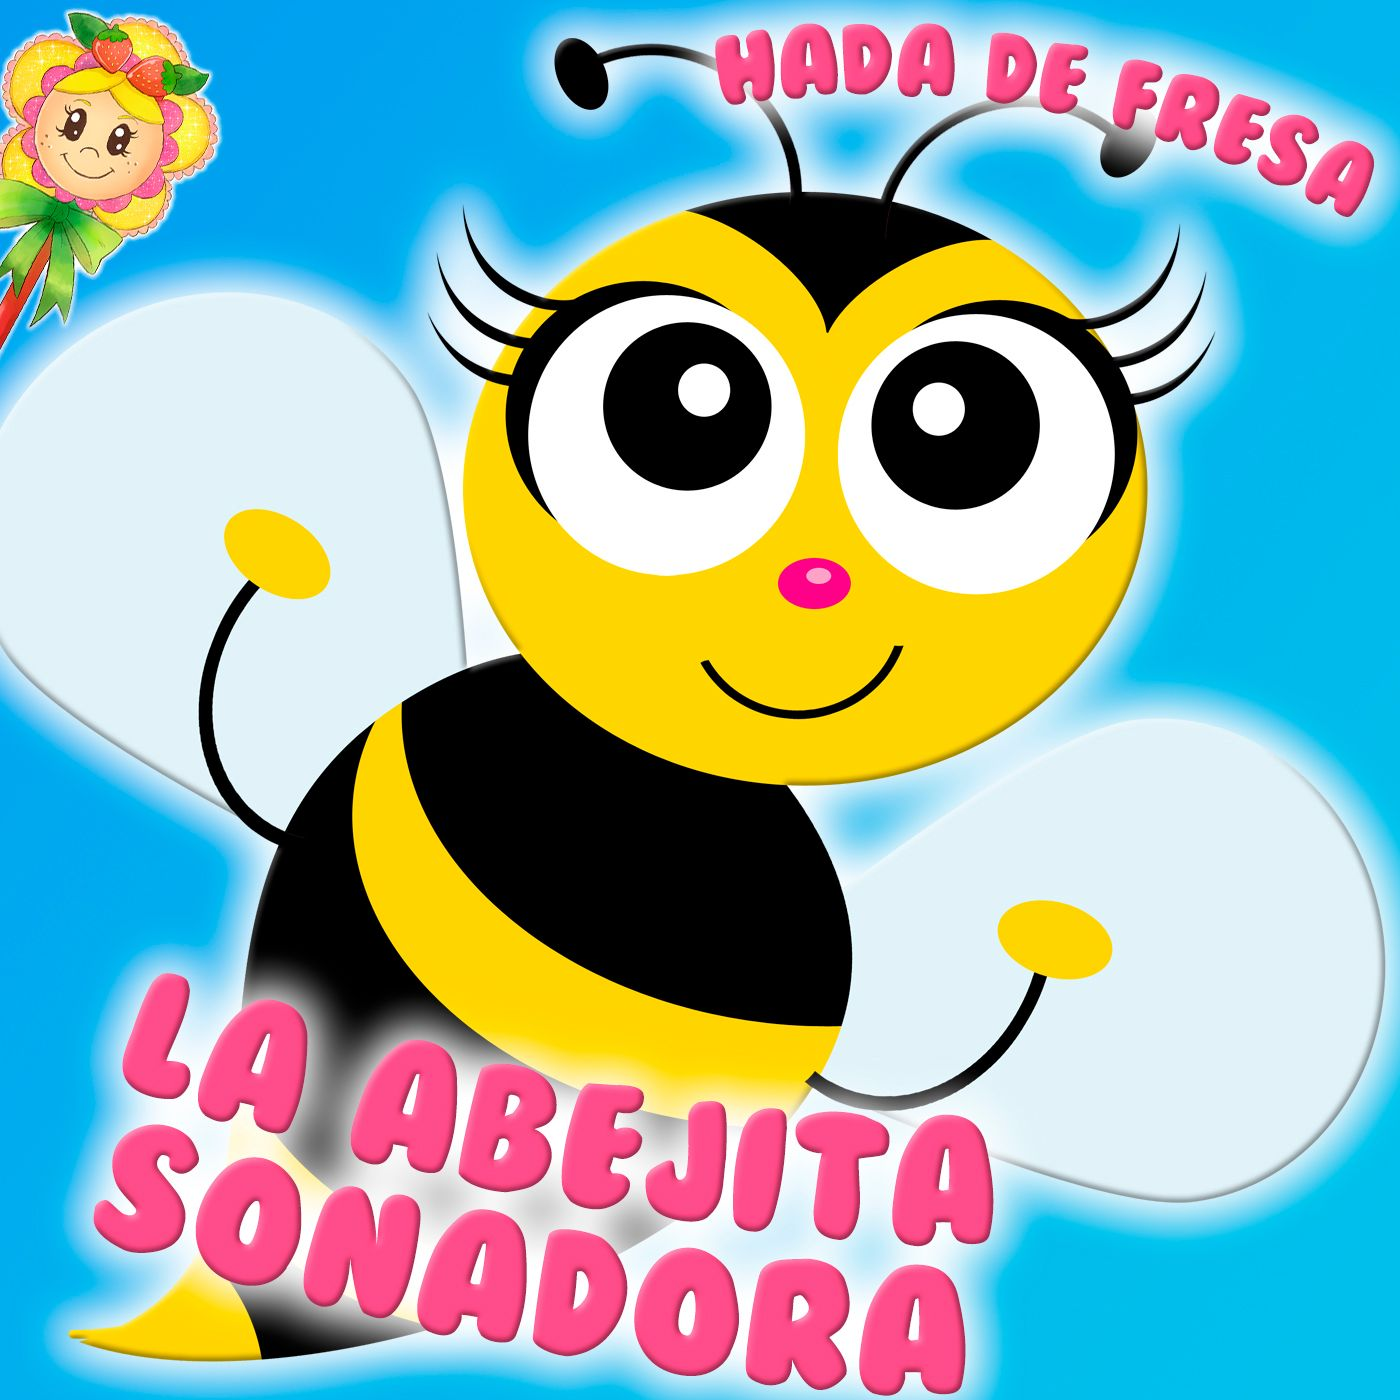 136. La abejita soñadora. Cuento infantil de Hada de Fresa sobre la abeja Maya